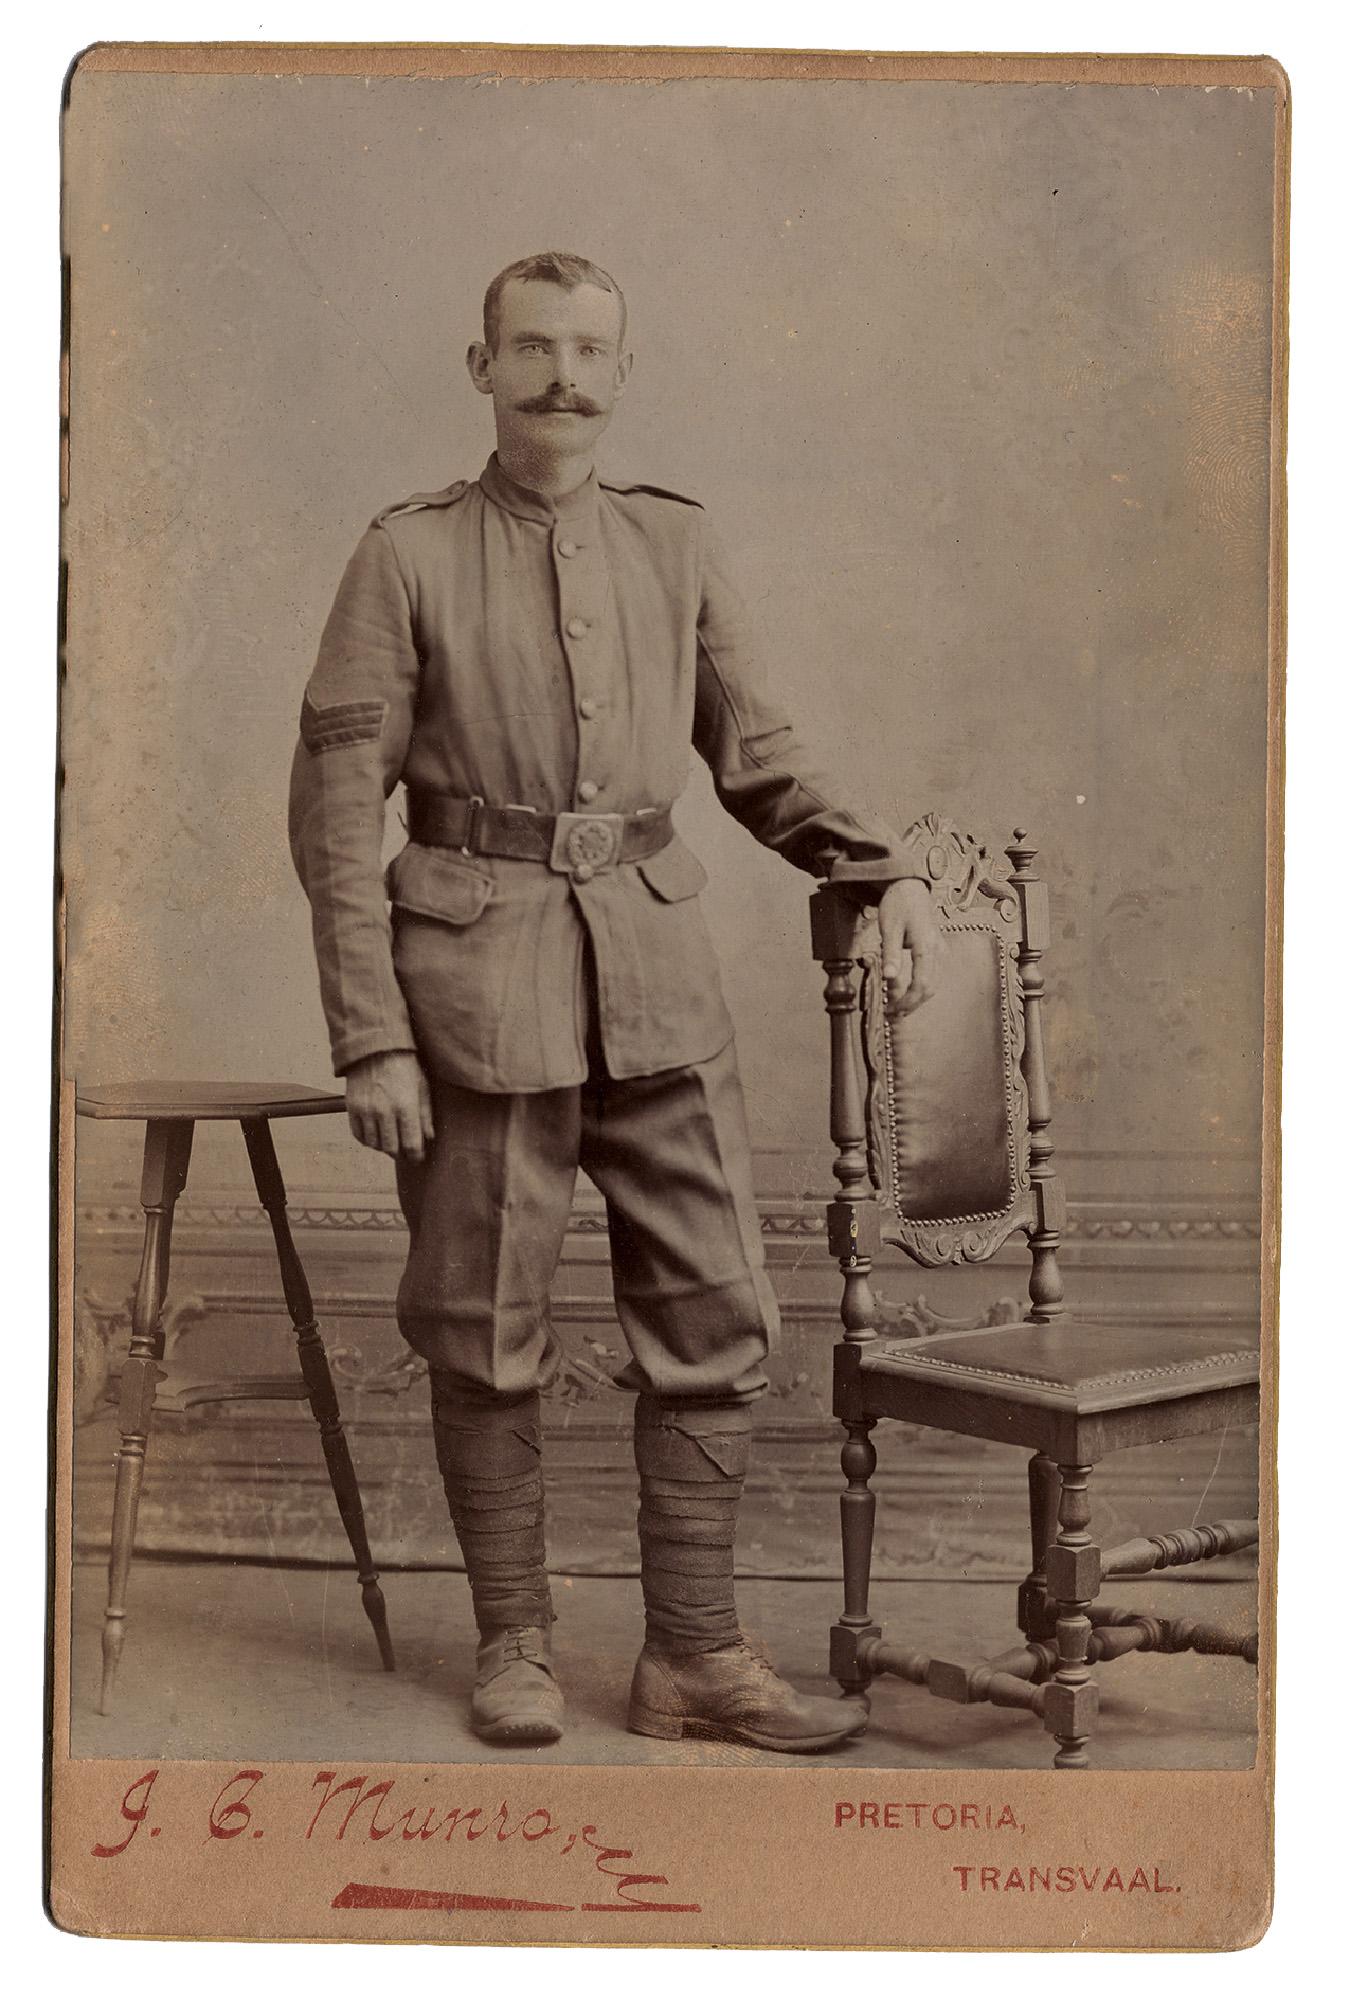 John Gillies in Pretoria, Transvaal, during the Second Boer War.